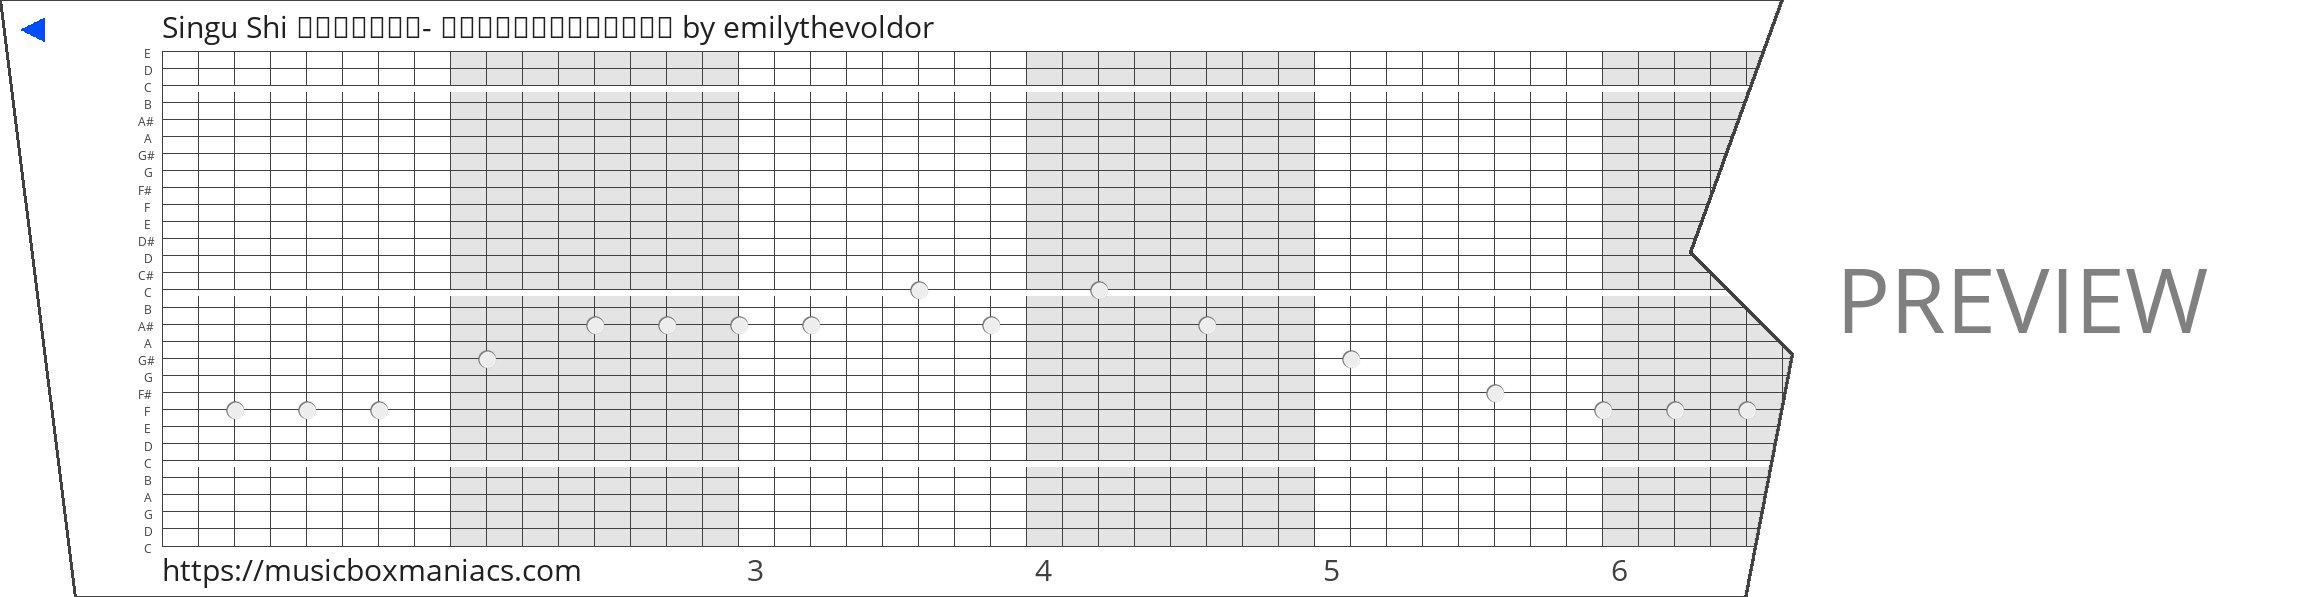 Singu Shi シング・シュジ- チョウ・デ・セーラム・シー 30 note music box paper strip